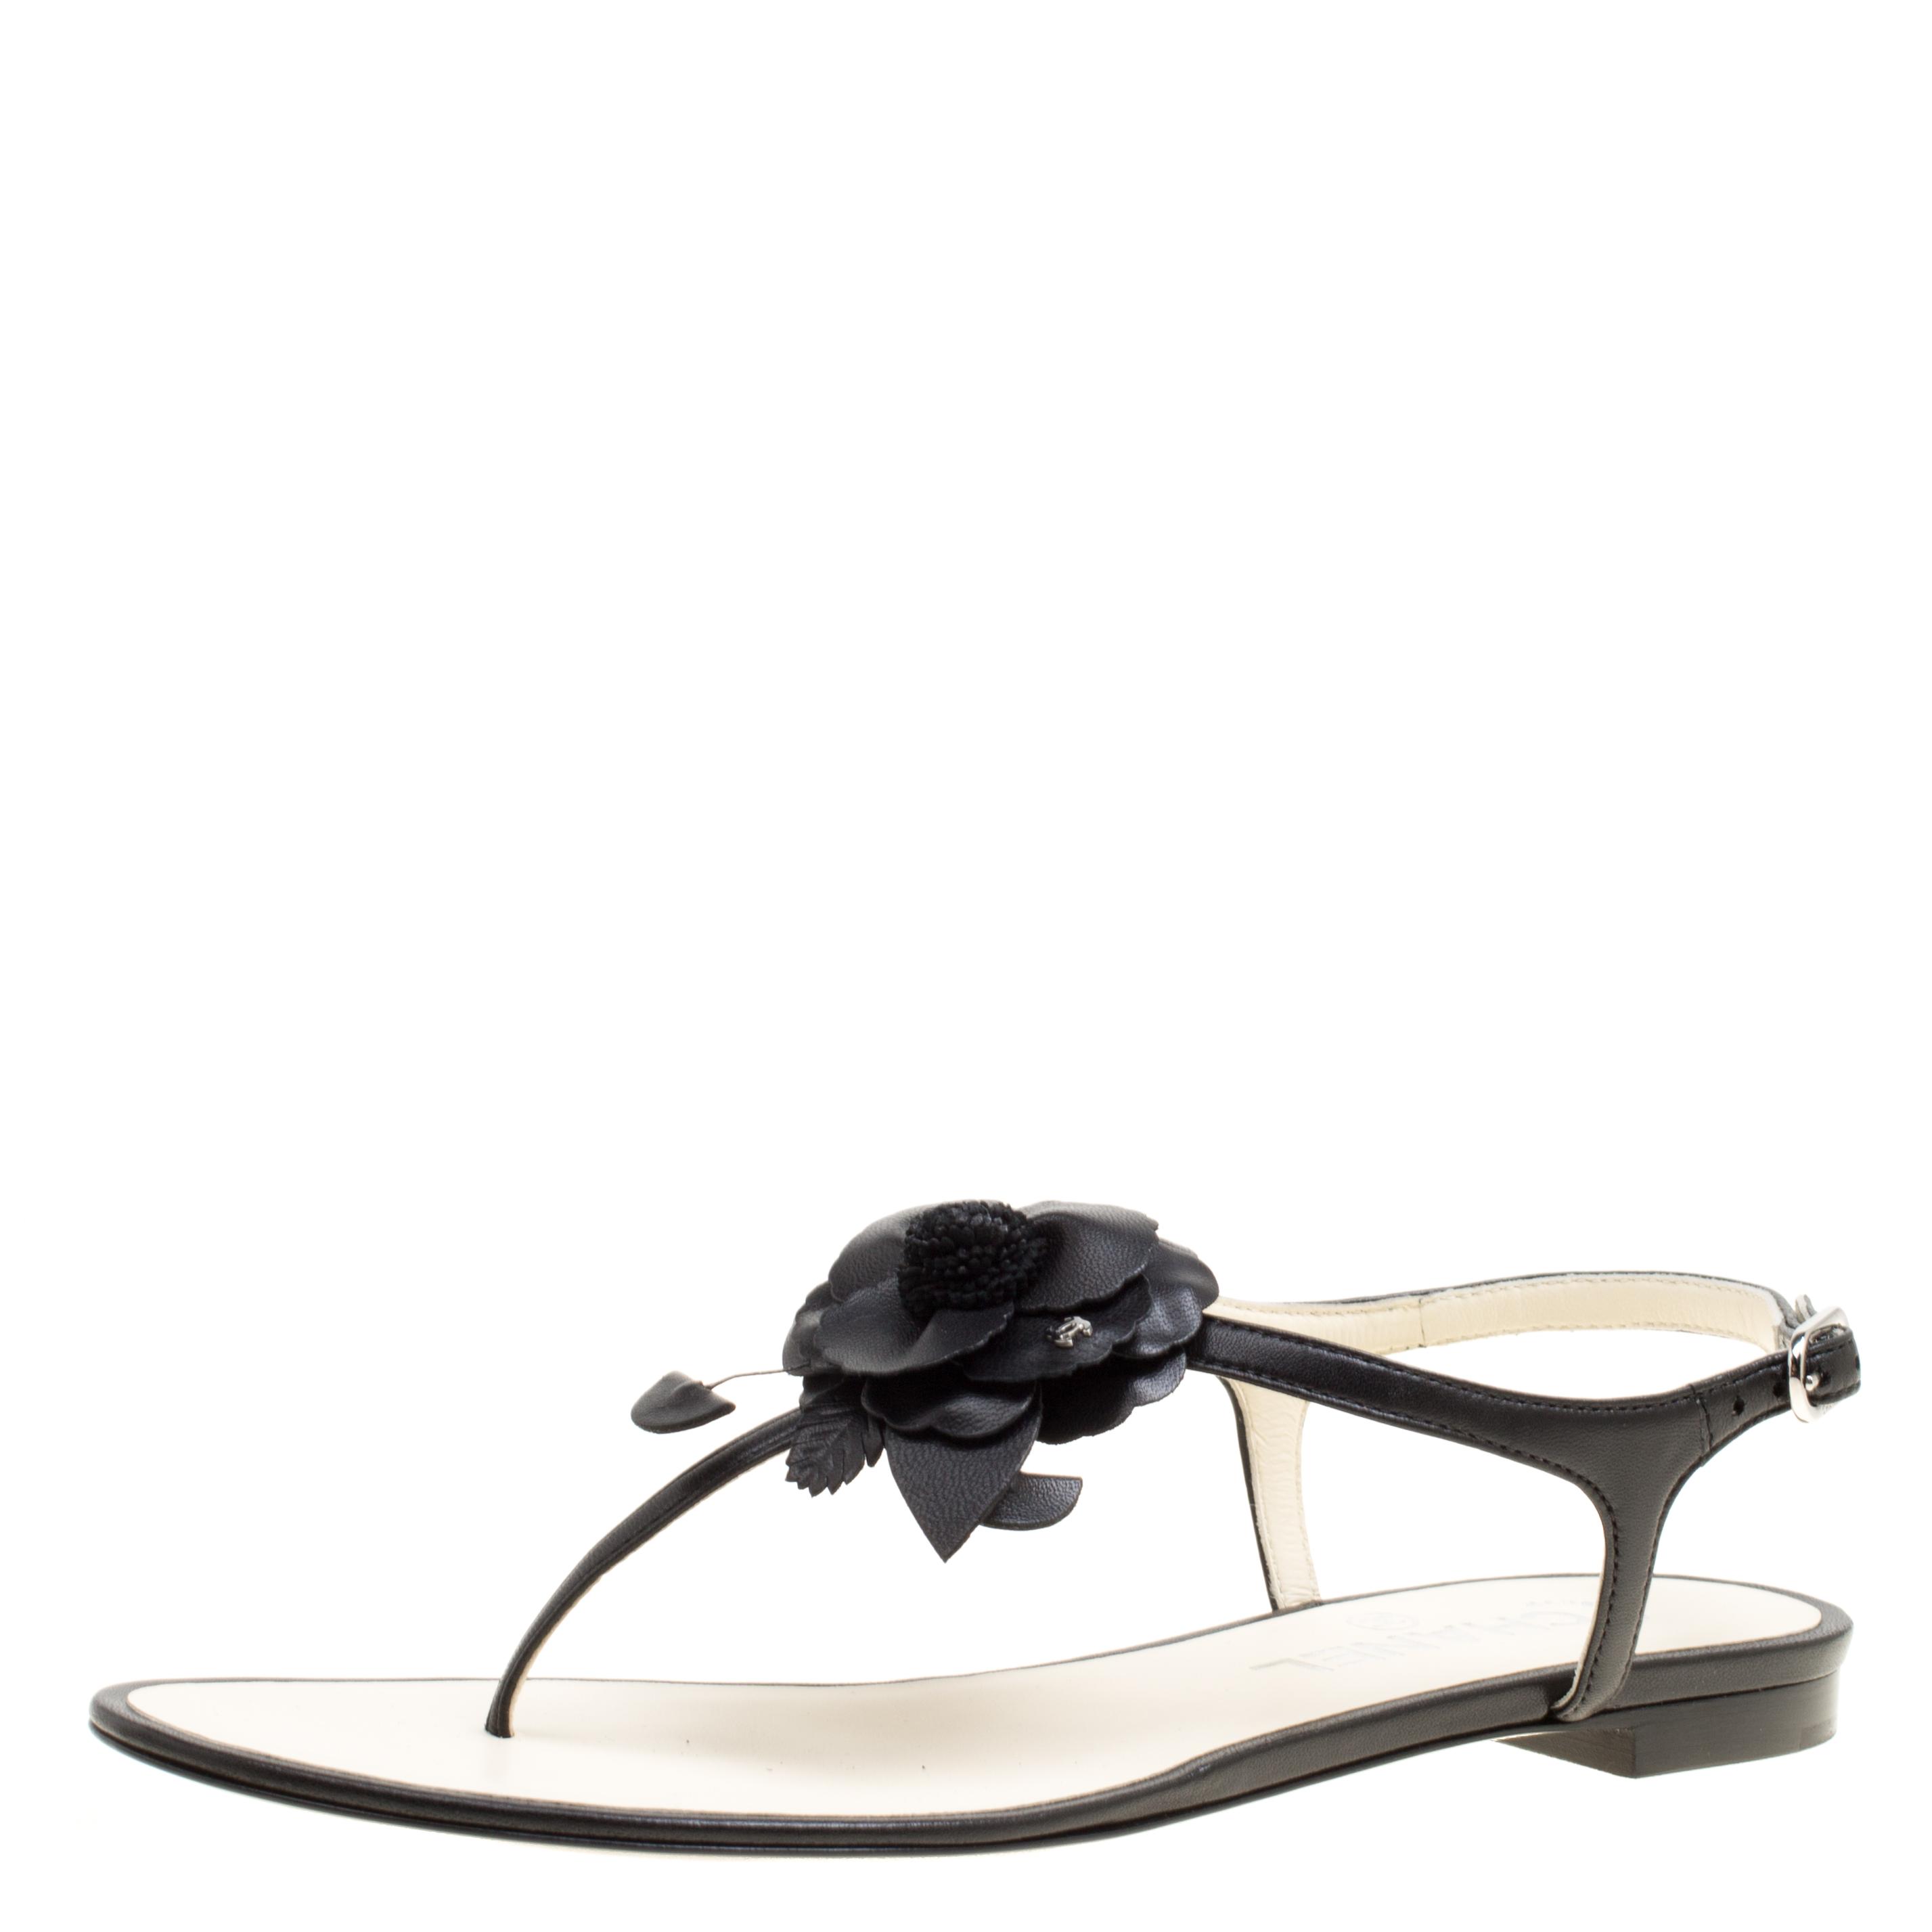 e8c7839dff455 ... Chanel Black Leather Camellia Flat Thong Sandals Size 38. nextprev.  prevnext